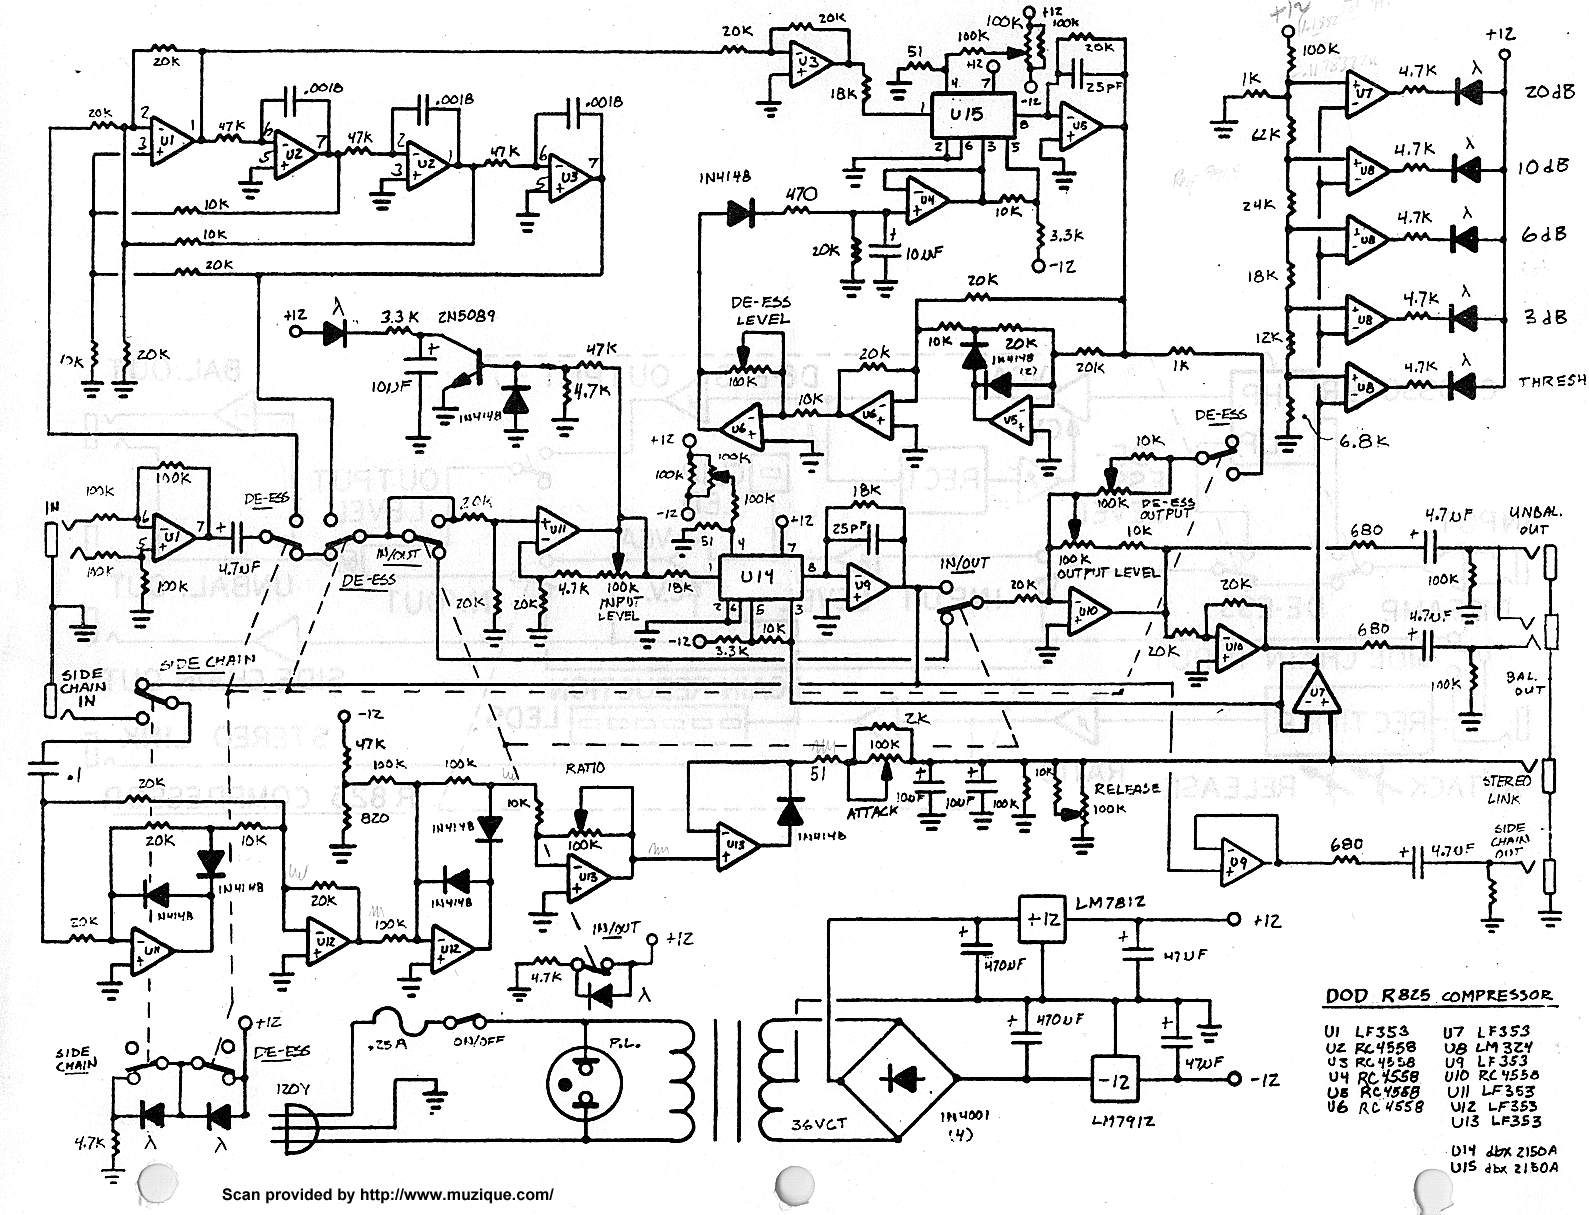 medium resolution of dod 825 compressor